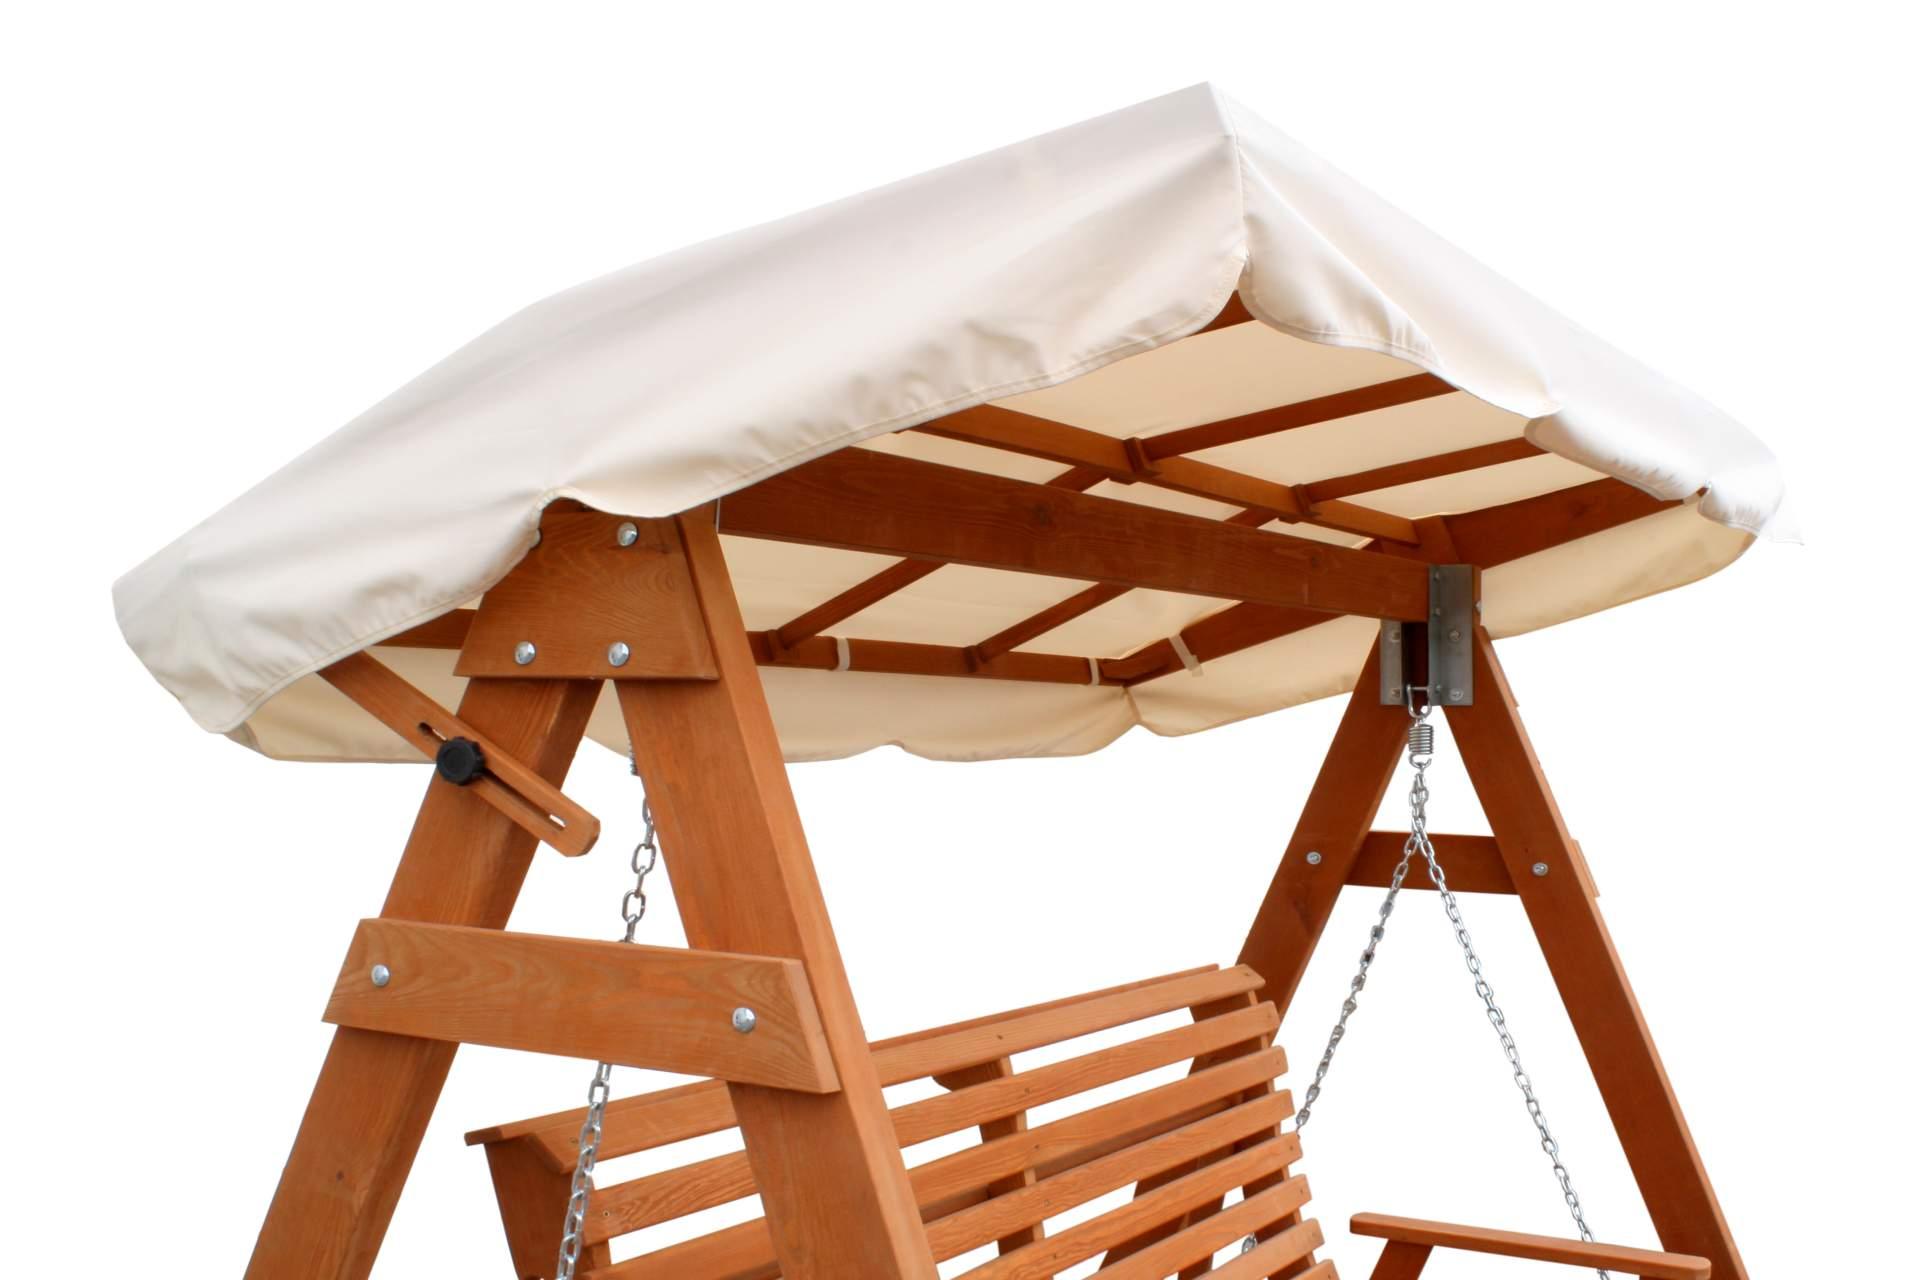 hollywoodschaukel ersatzdach f r holz schaukel 110 x 187 cm. Black Bedroom Furniture Sets. Home Design Ideas